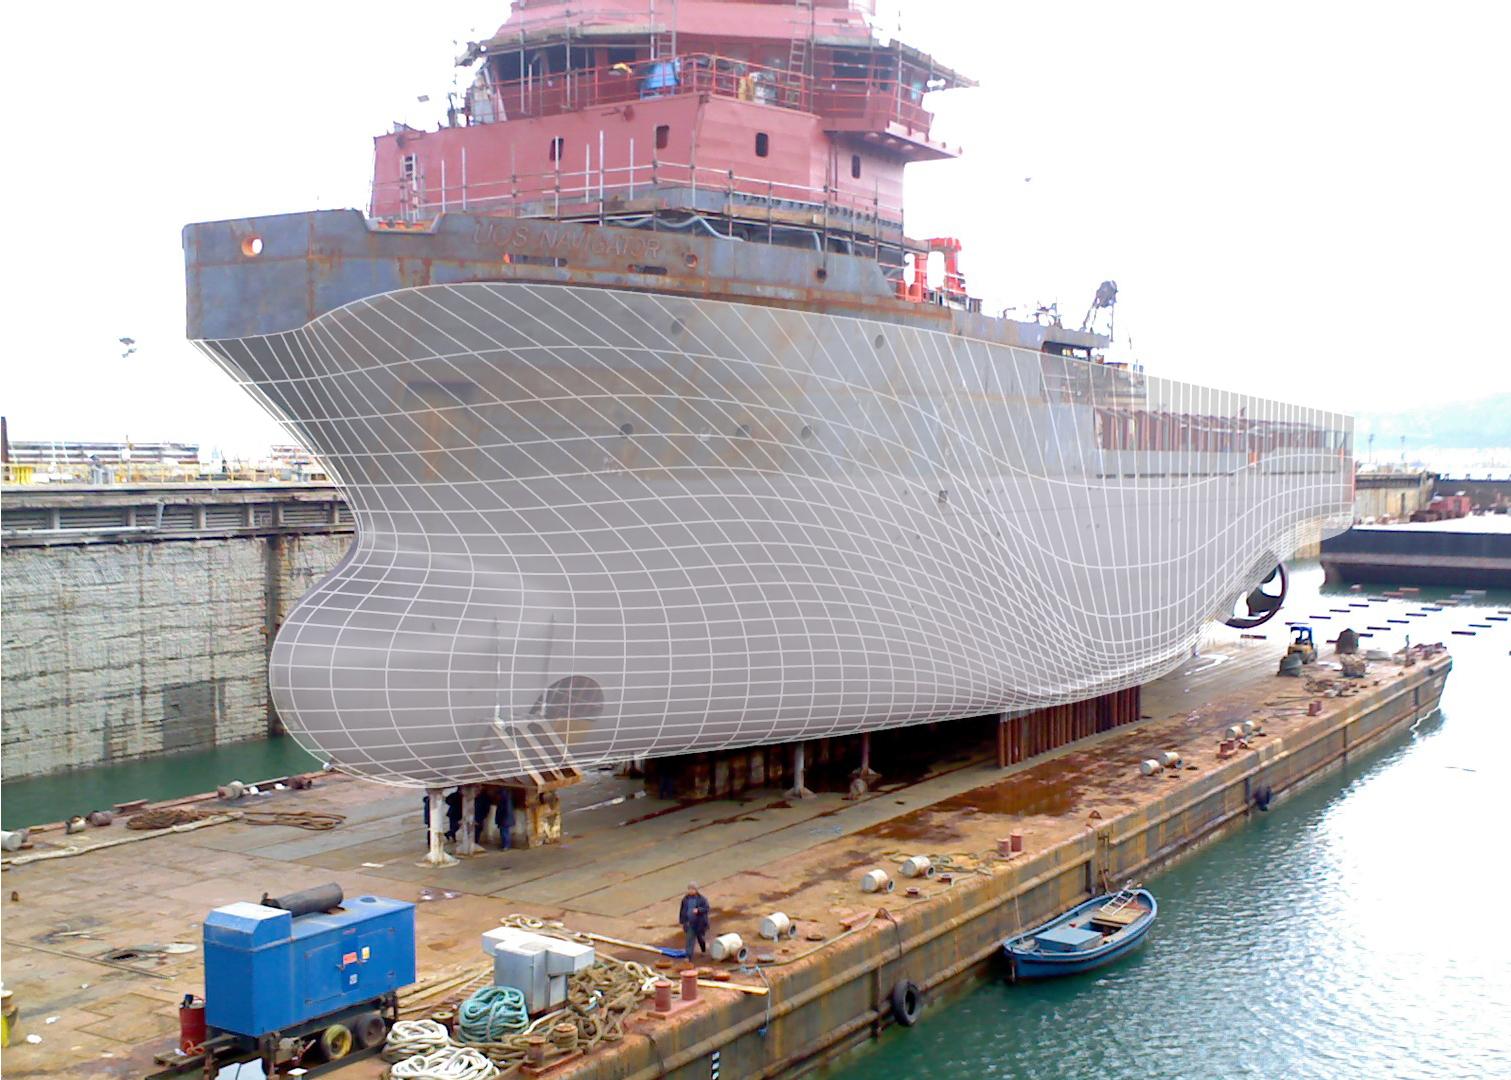 Rhinoceros Report Ship Hull From A Linesplan With Rhino